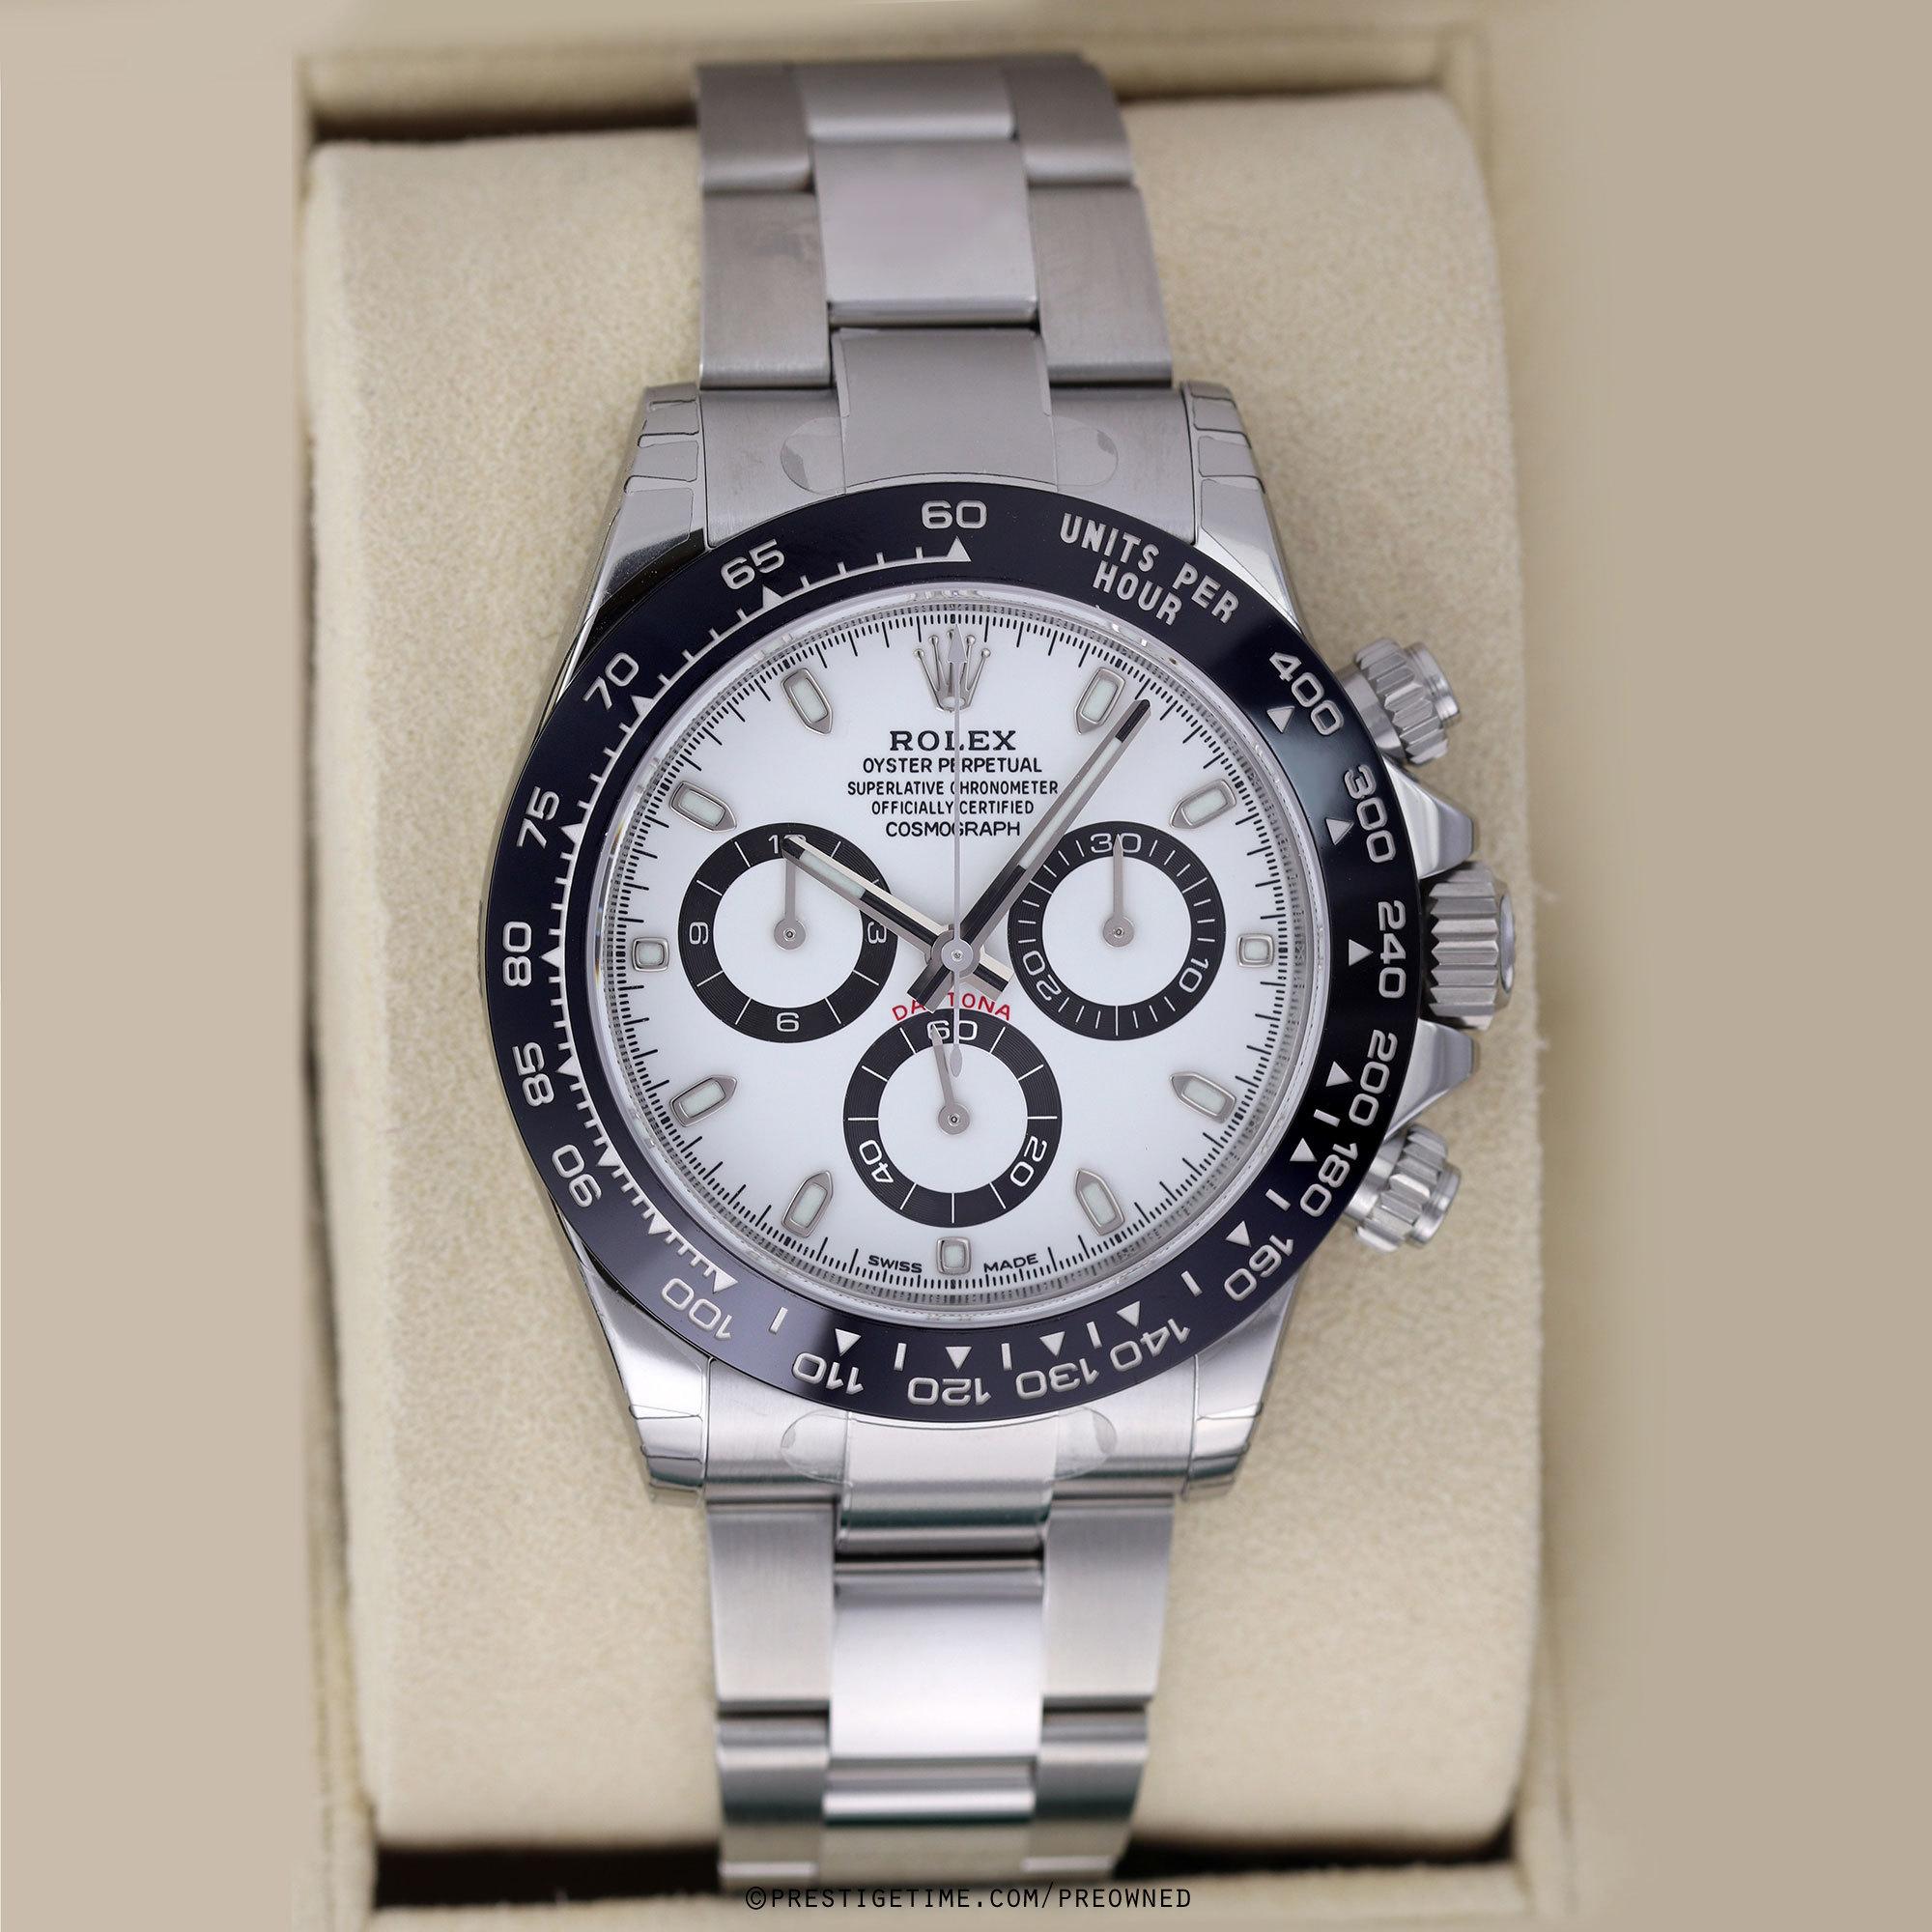 Pre-owned Rolex Cosmograph Daytona 116500LN White